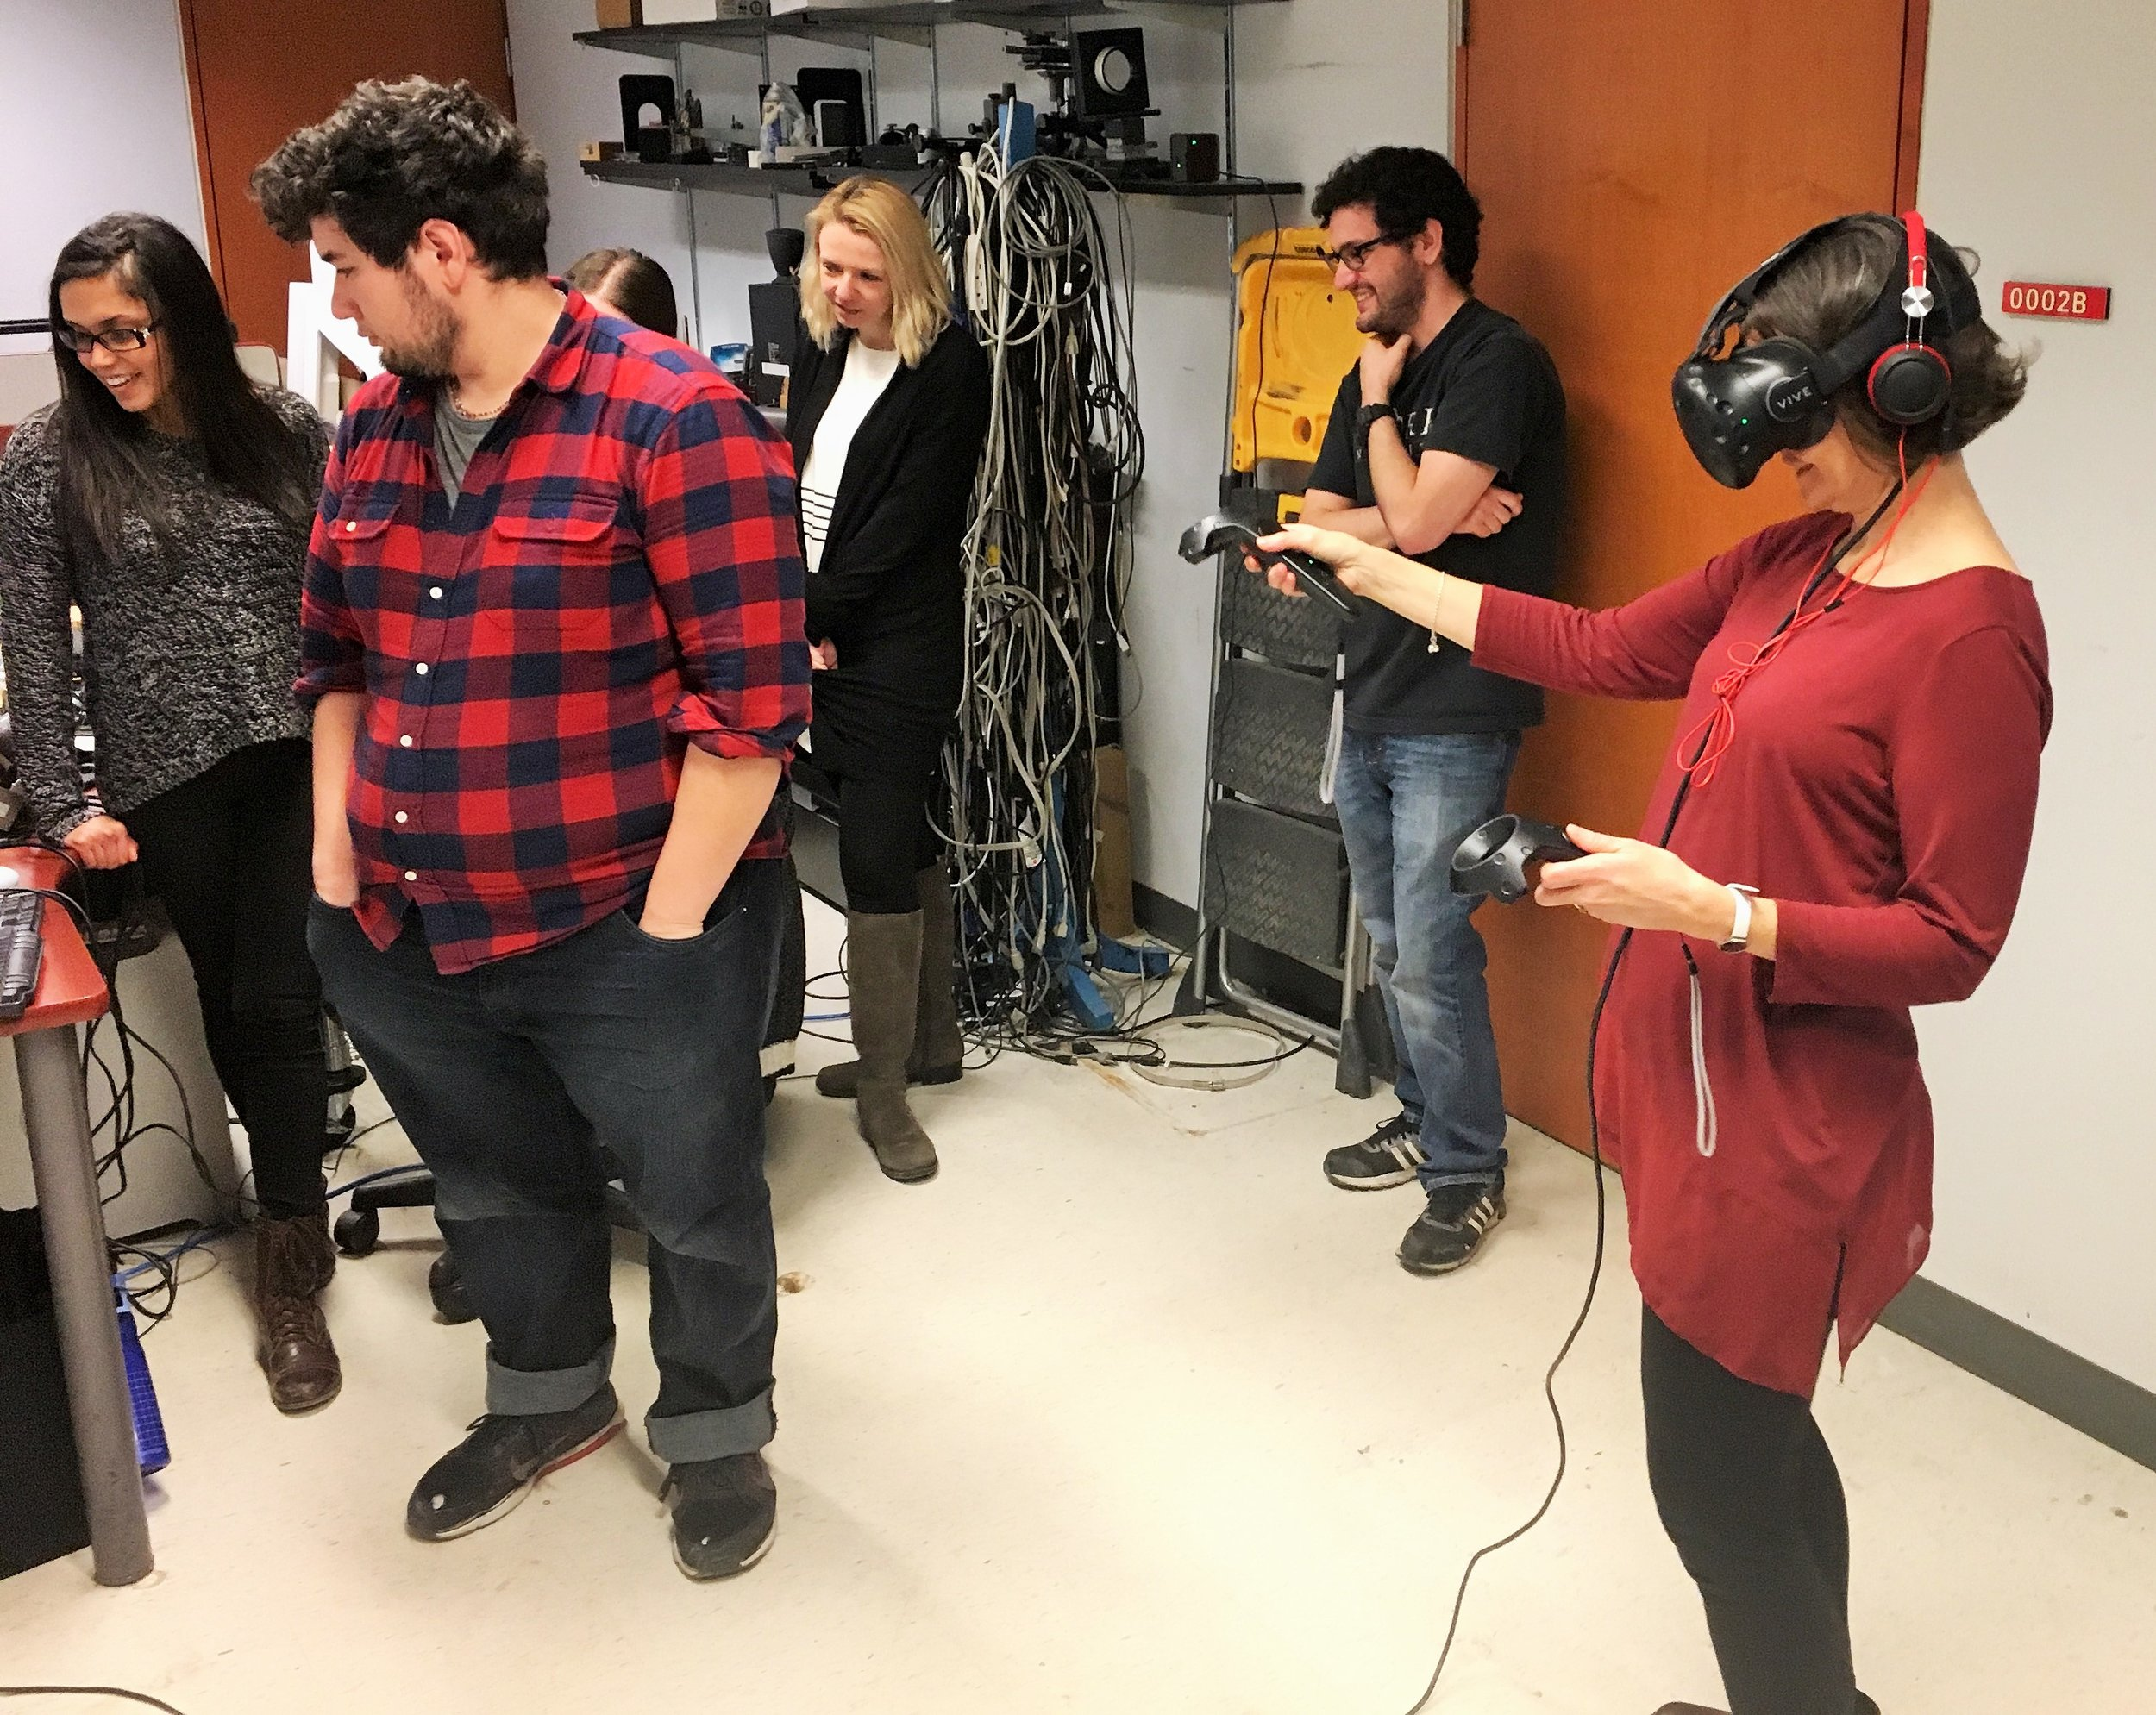 Having fun in the world of Virtual Reality.